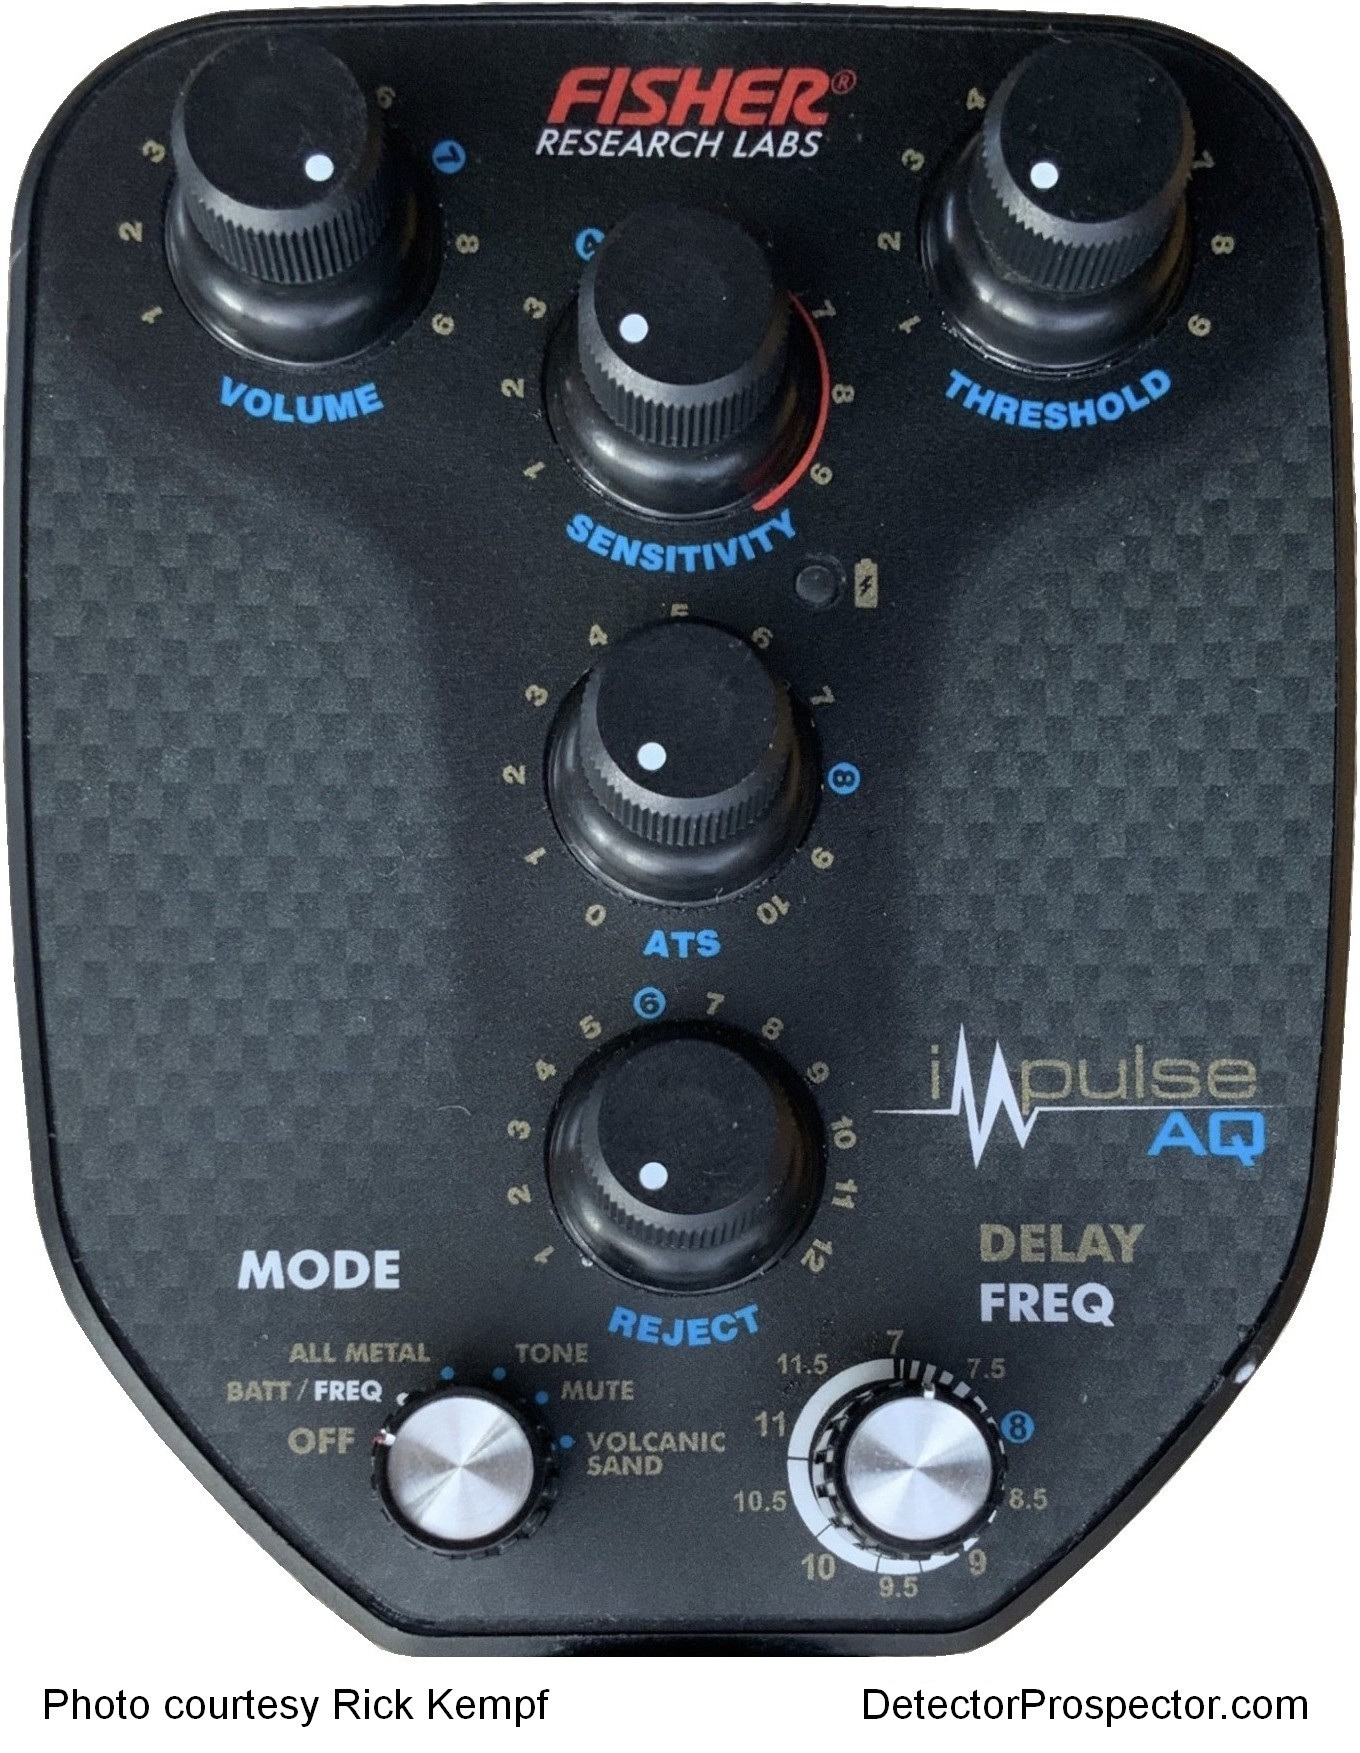 fisher-impulse-aq-control-panel-2020.jpg